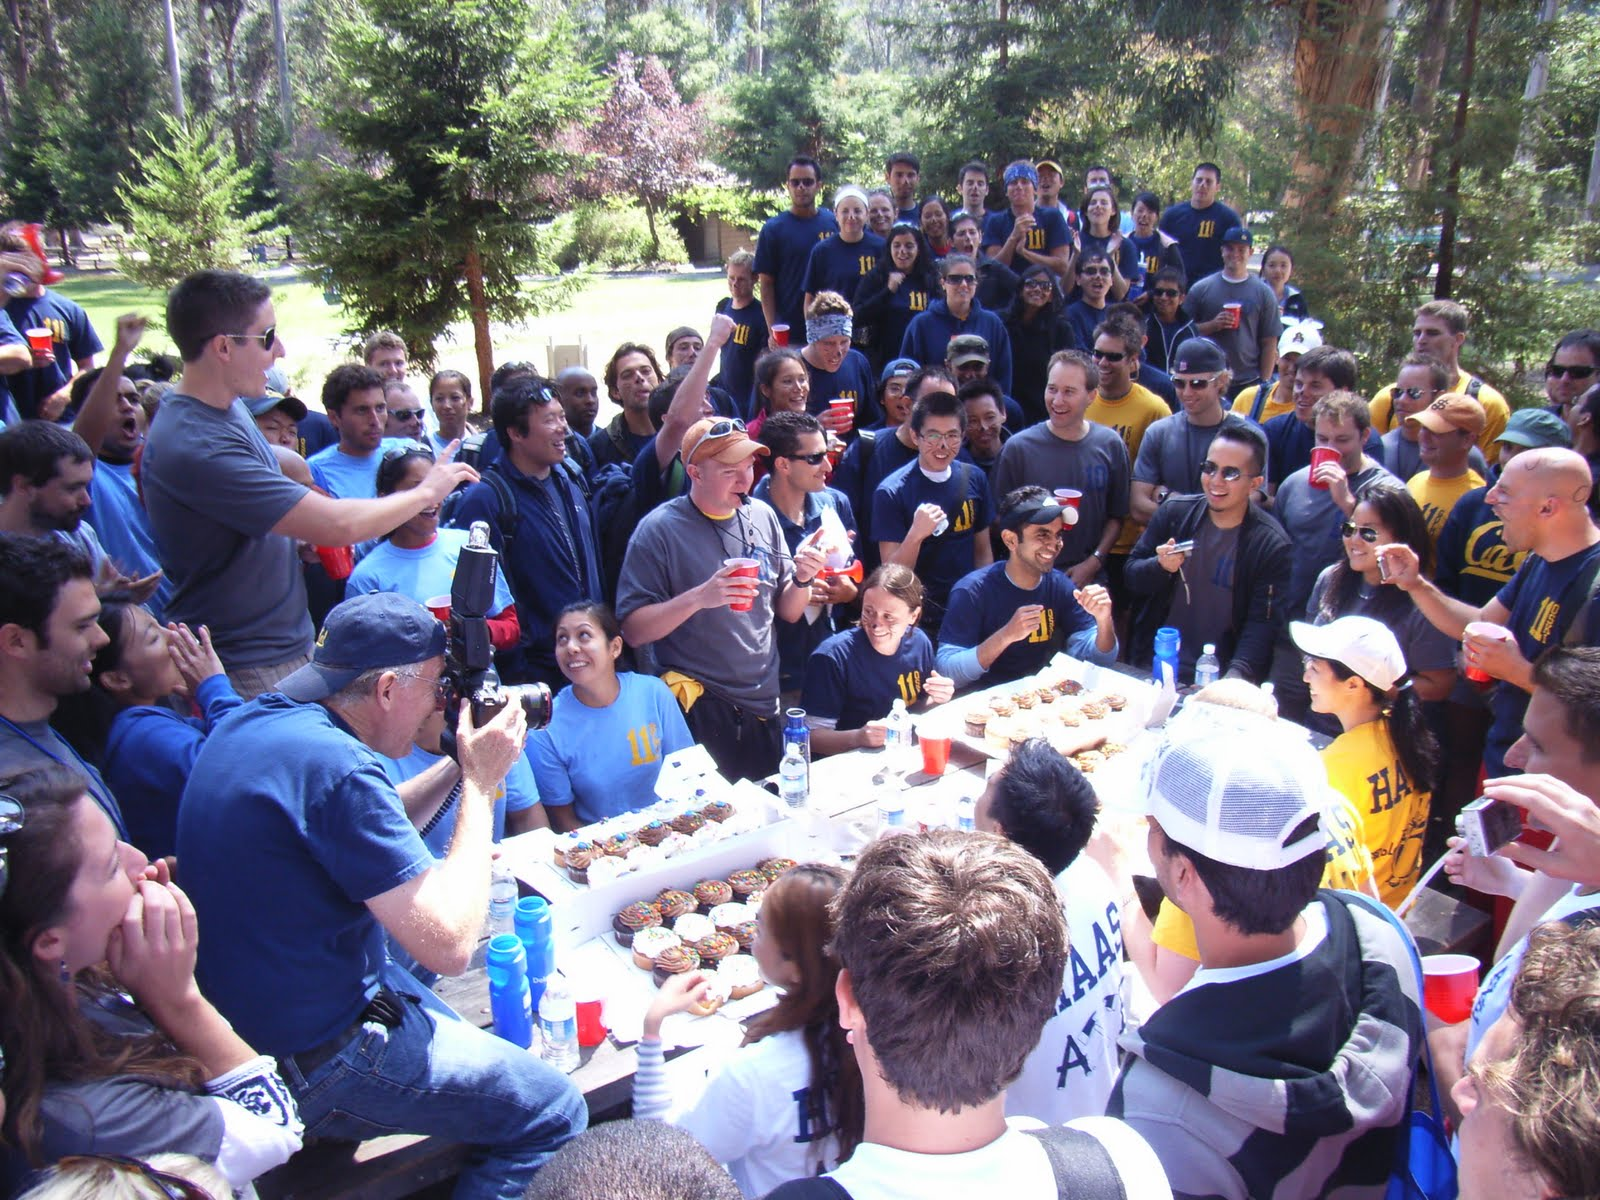 Berkeley / Haas MBA Essay Questions 2018-2019